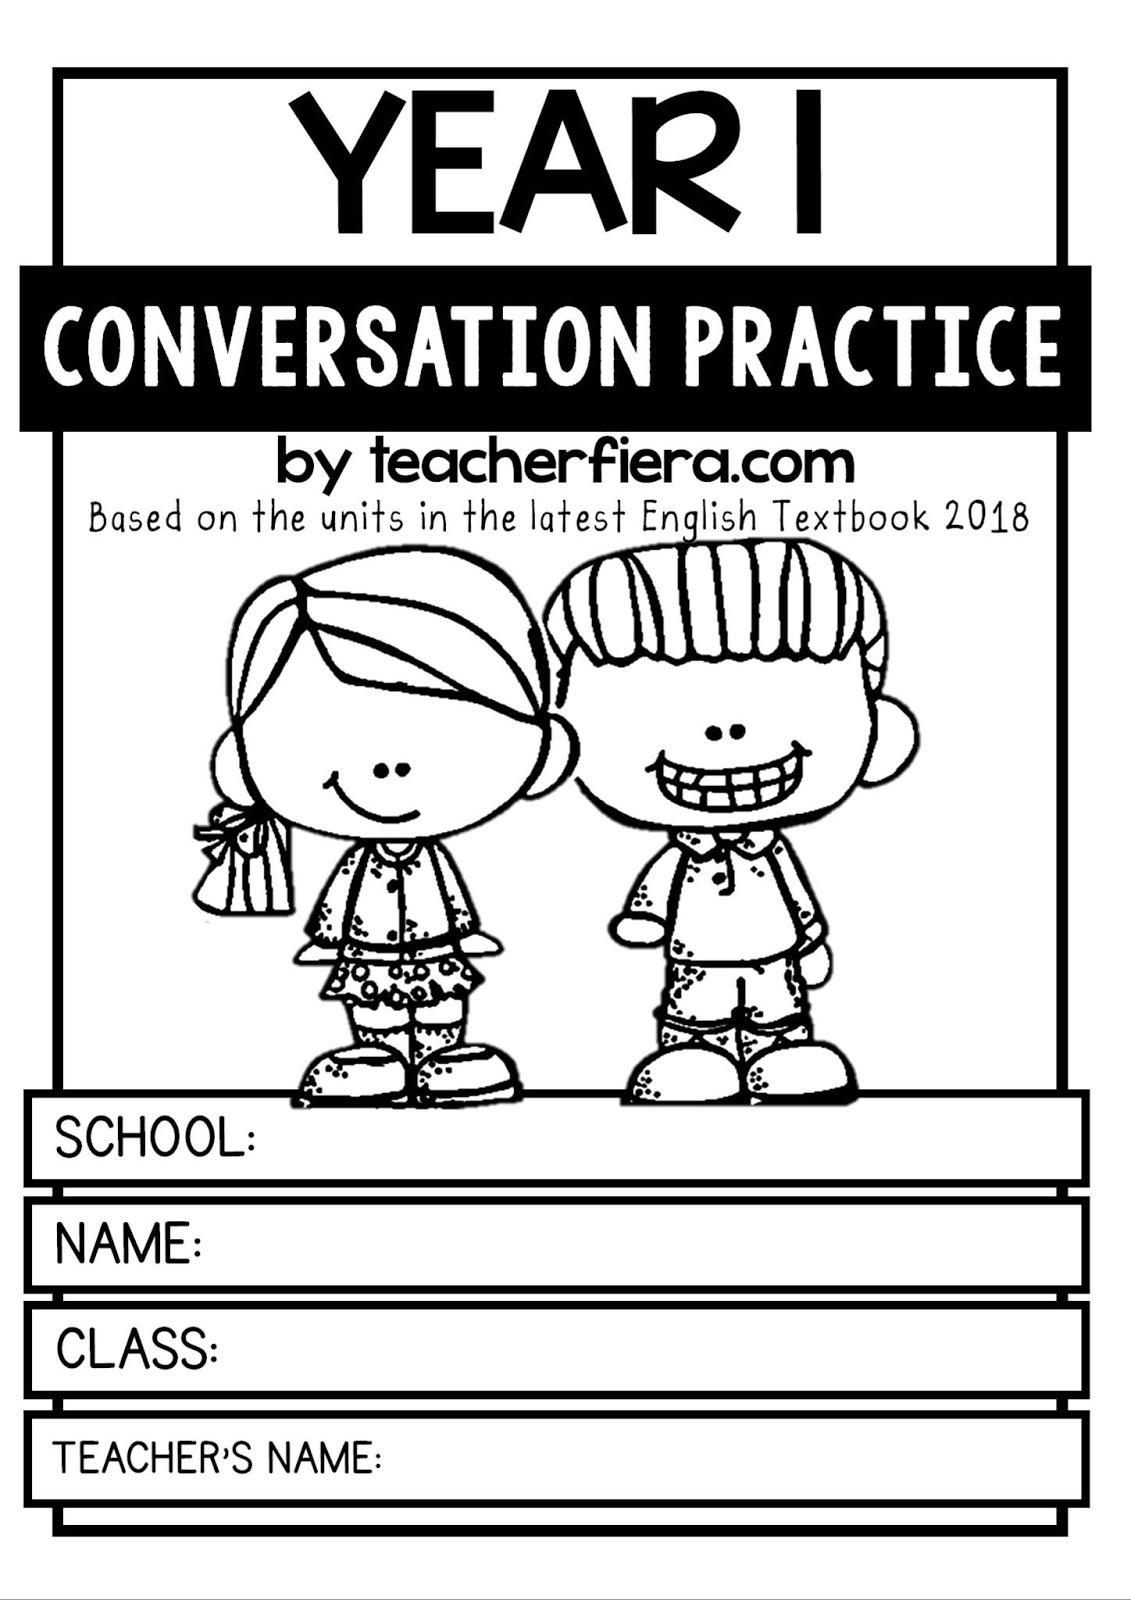 teacherfiera com: YEAR 1 CONVERSATION PRACTICE BASED ON